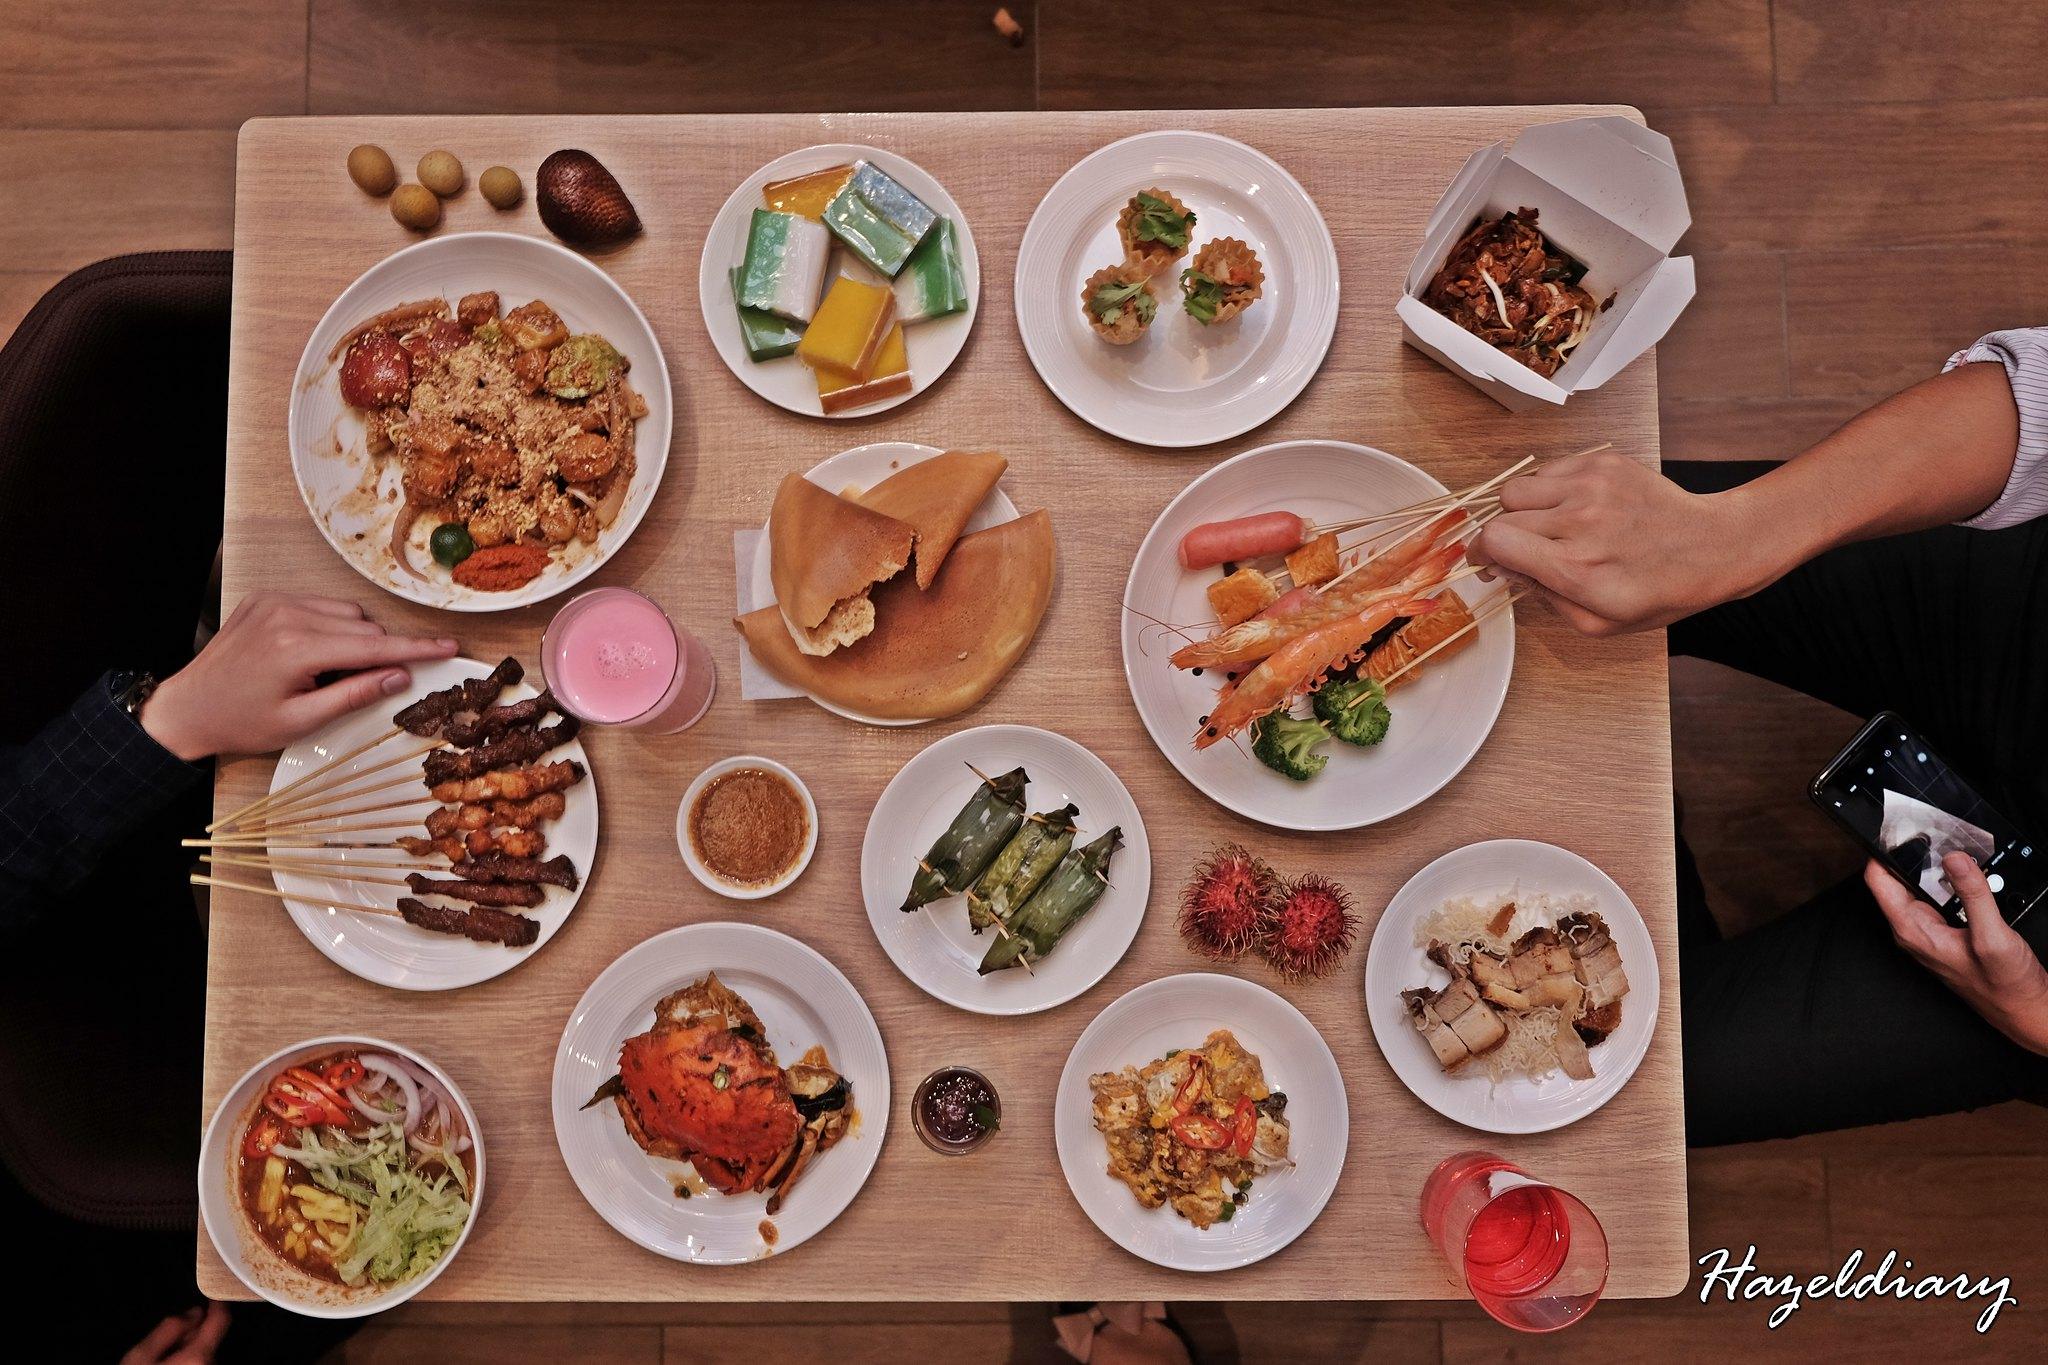 Penang Food Fare Buffet-Sky22 Courtyard Marriott-Hazeldiary